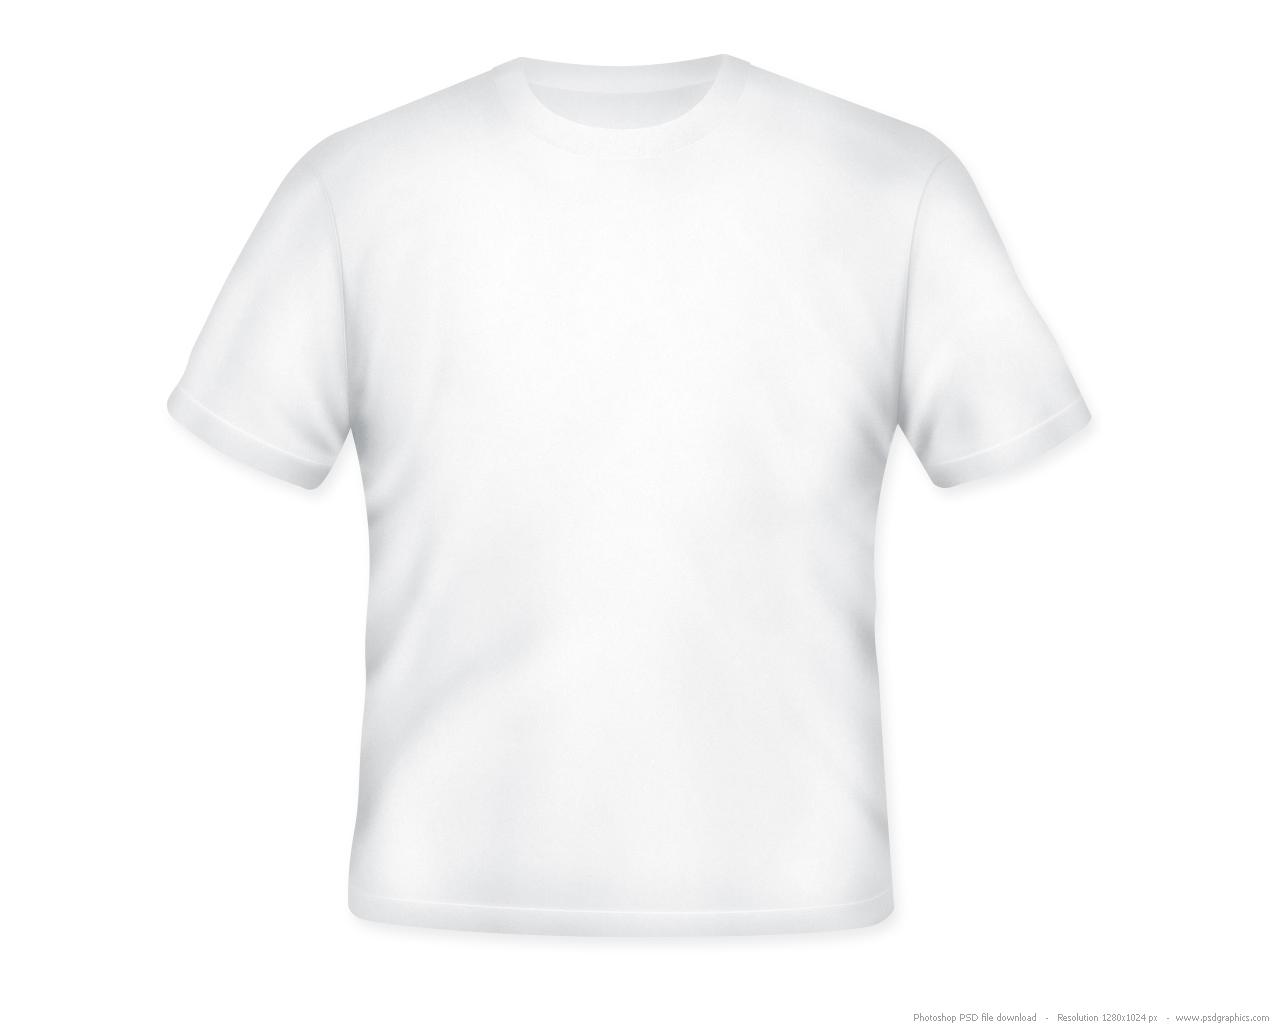 White T-Shirt Template